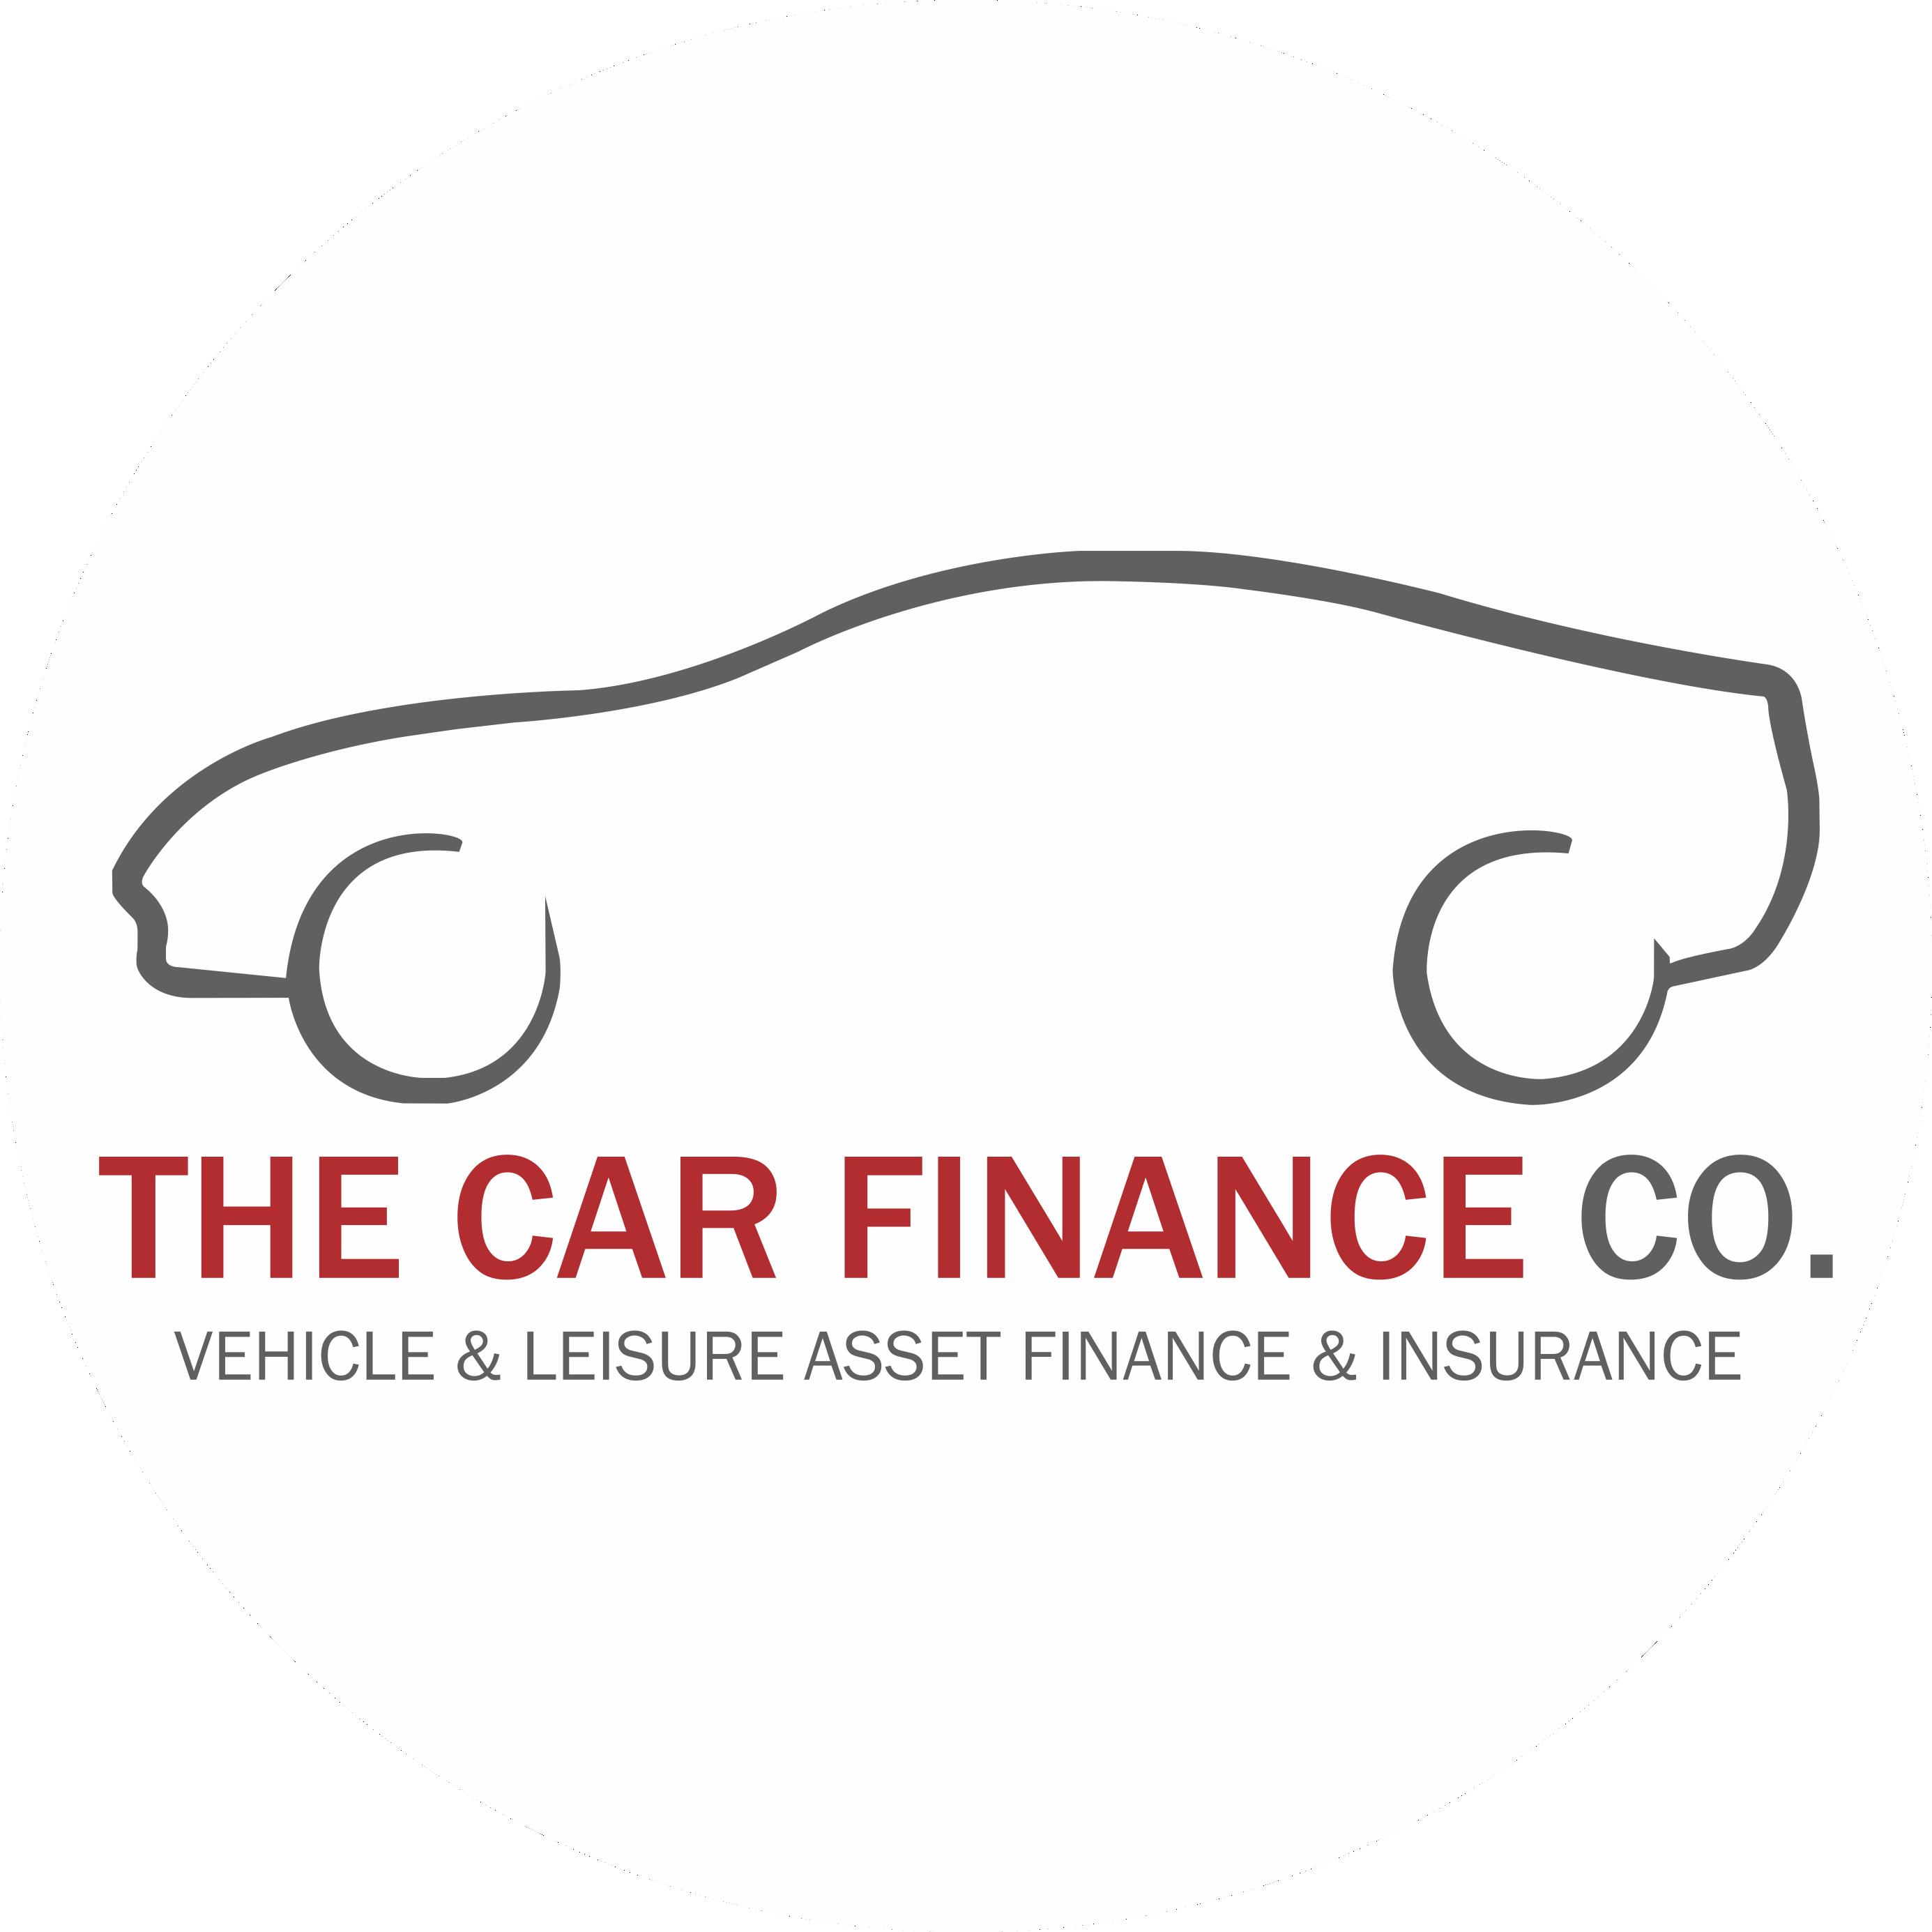 The Car Finance Company